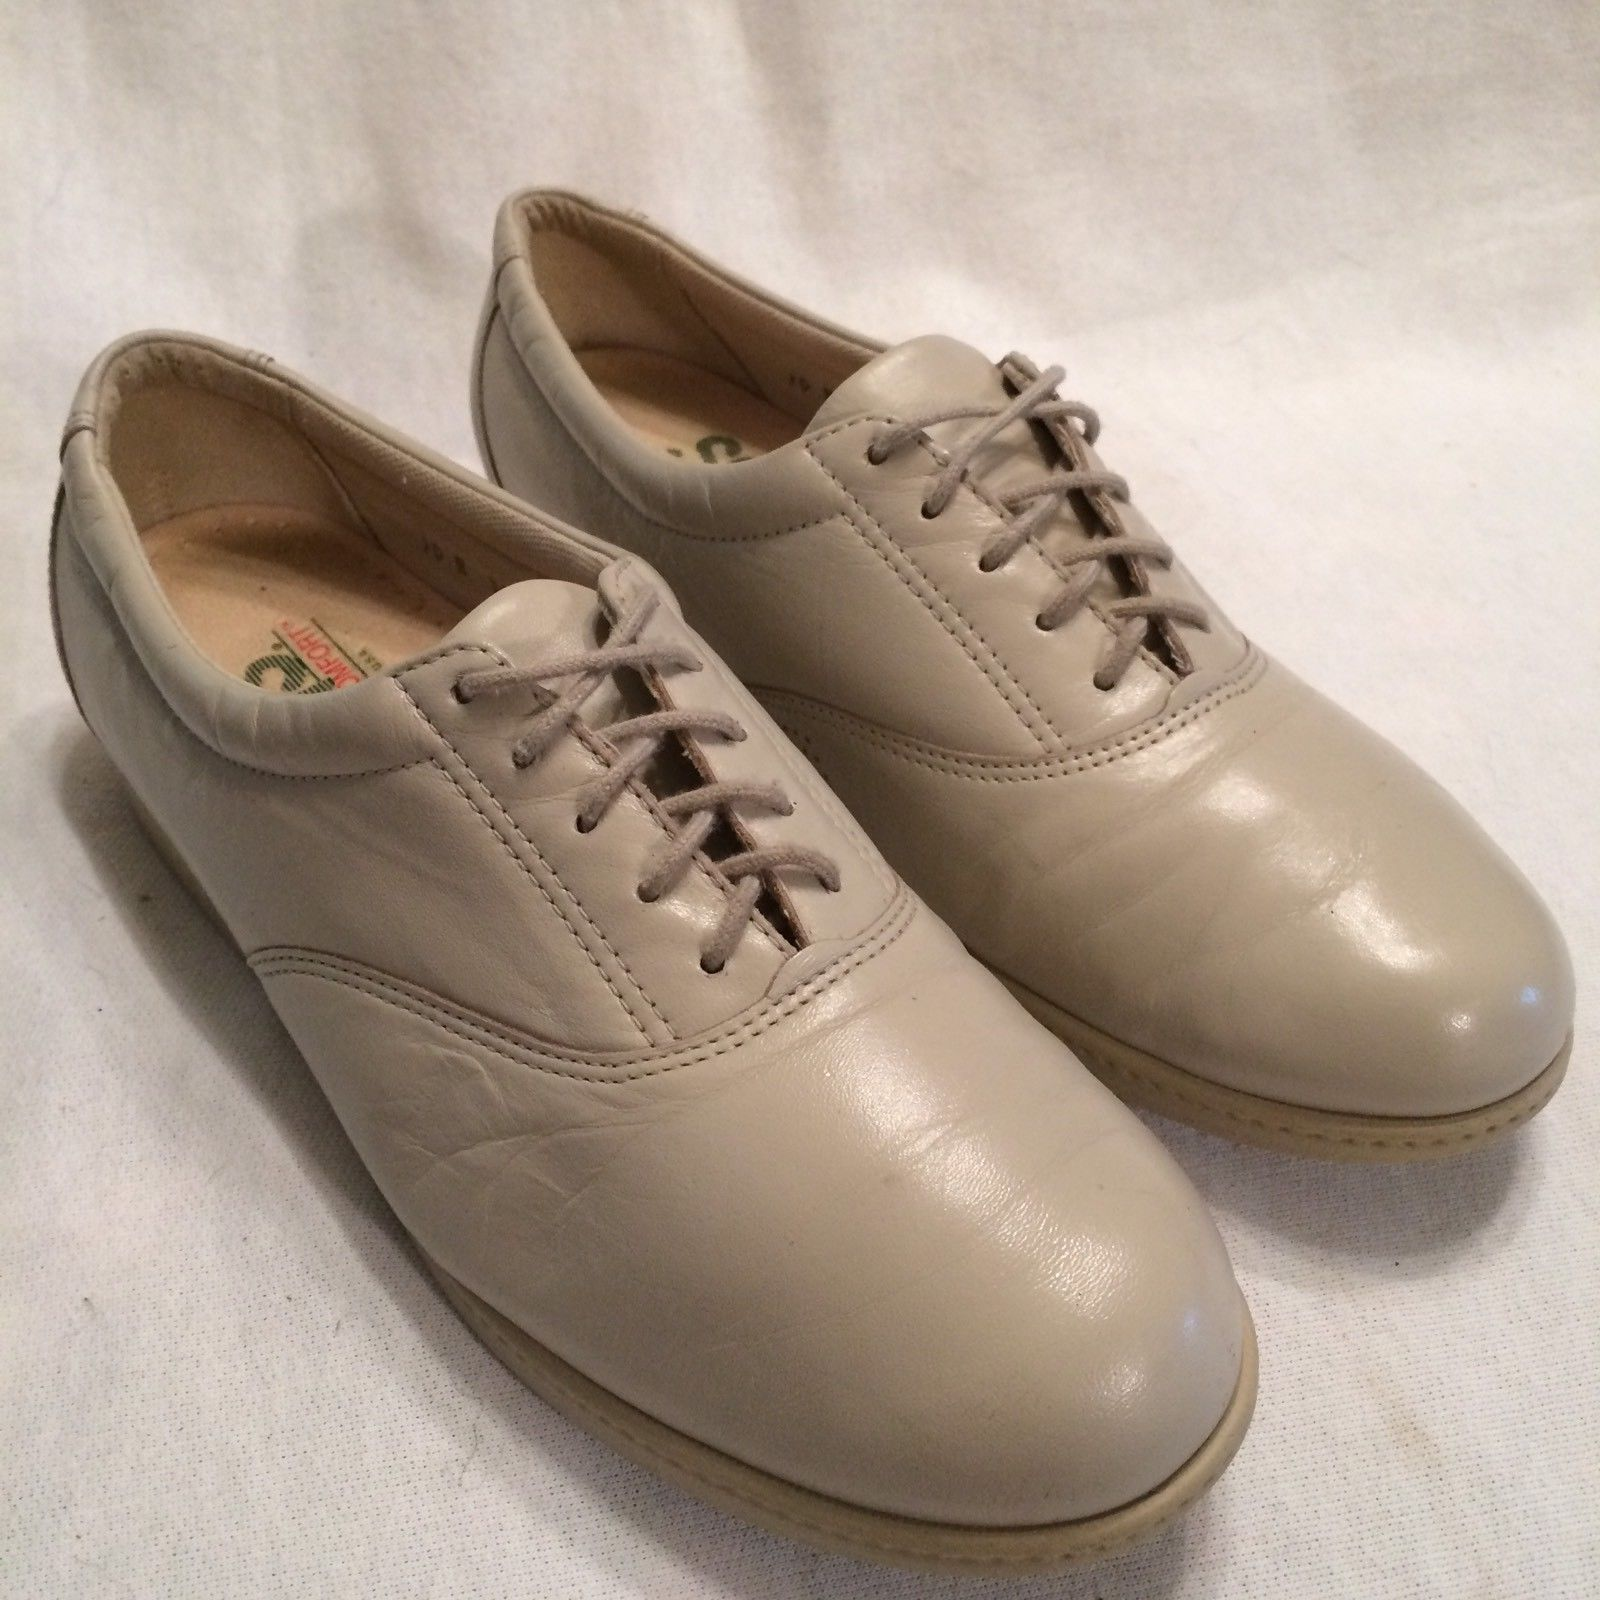 SAS Tripad Comfort Free Time Walking Oxfords Leather USA Brown Women's Size 7.5M